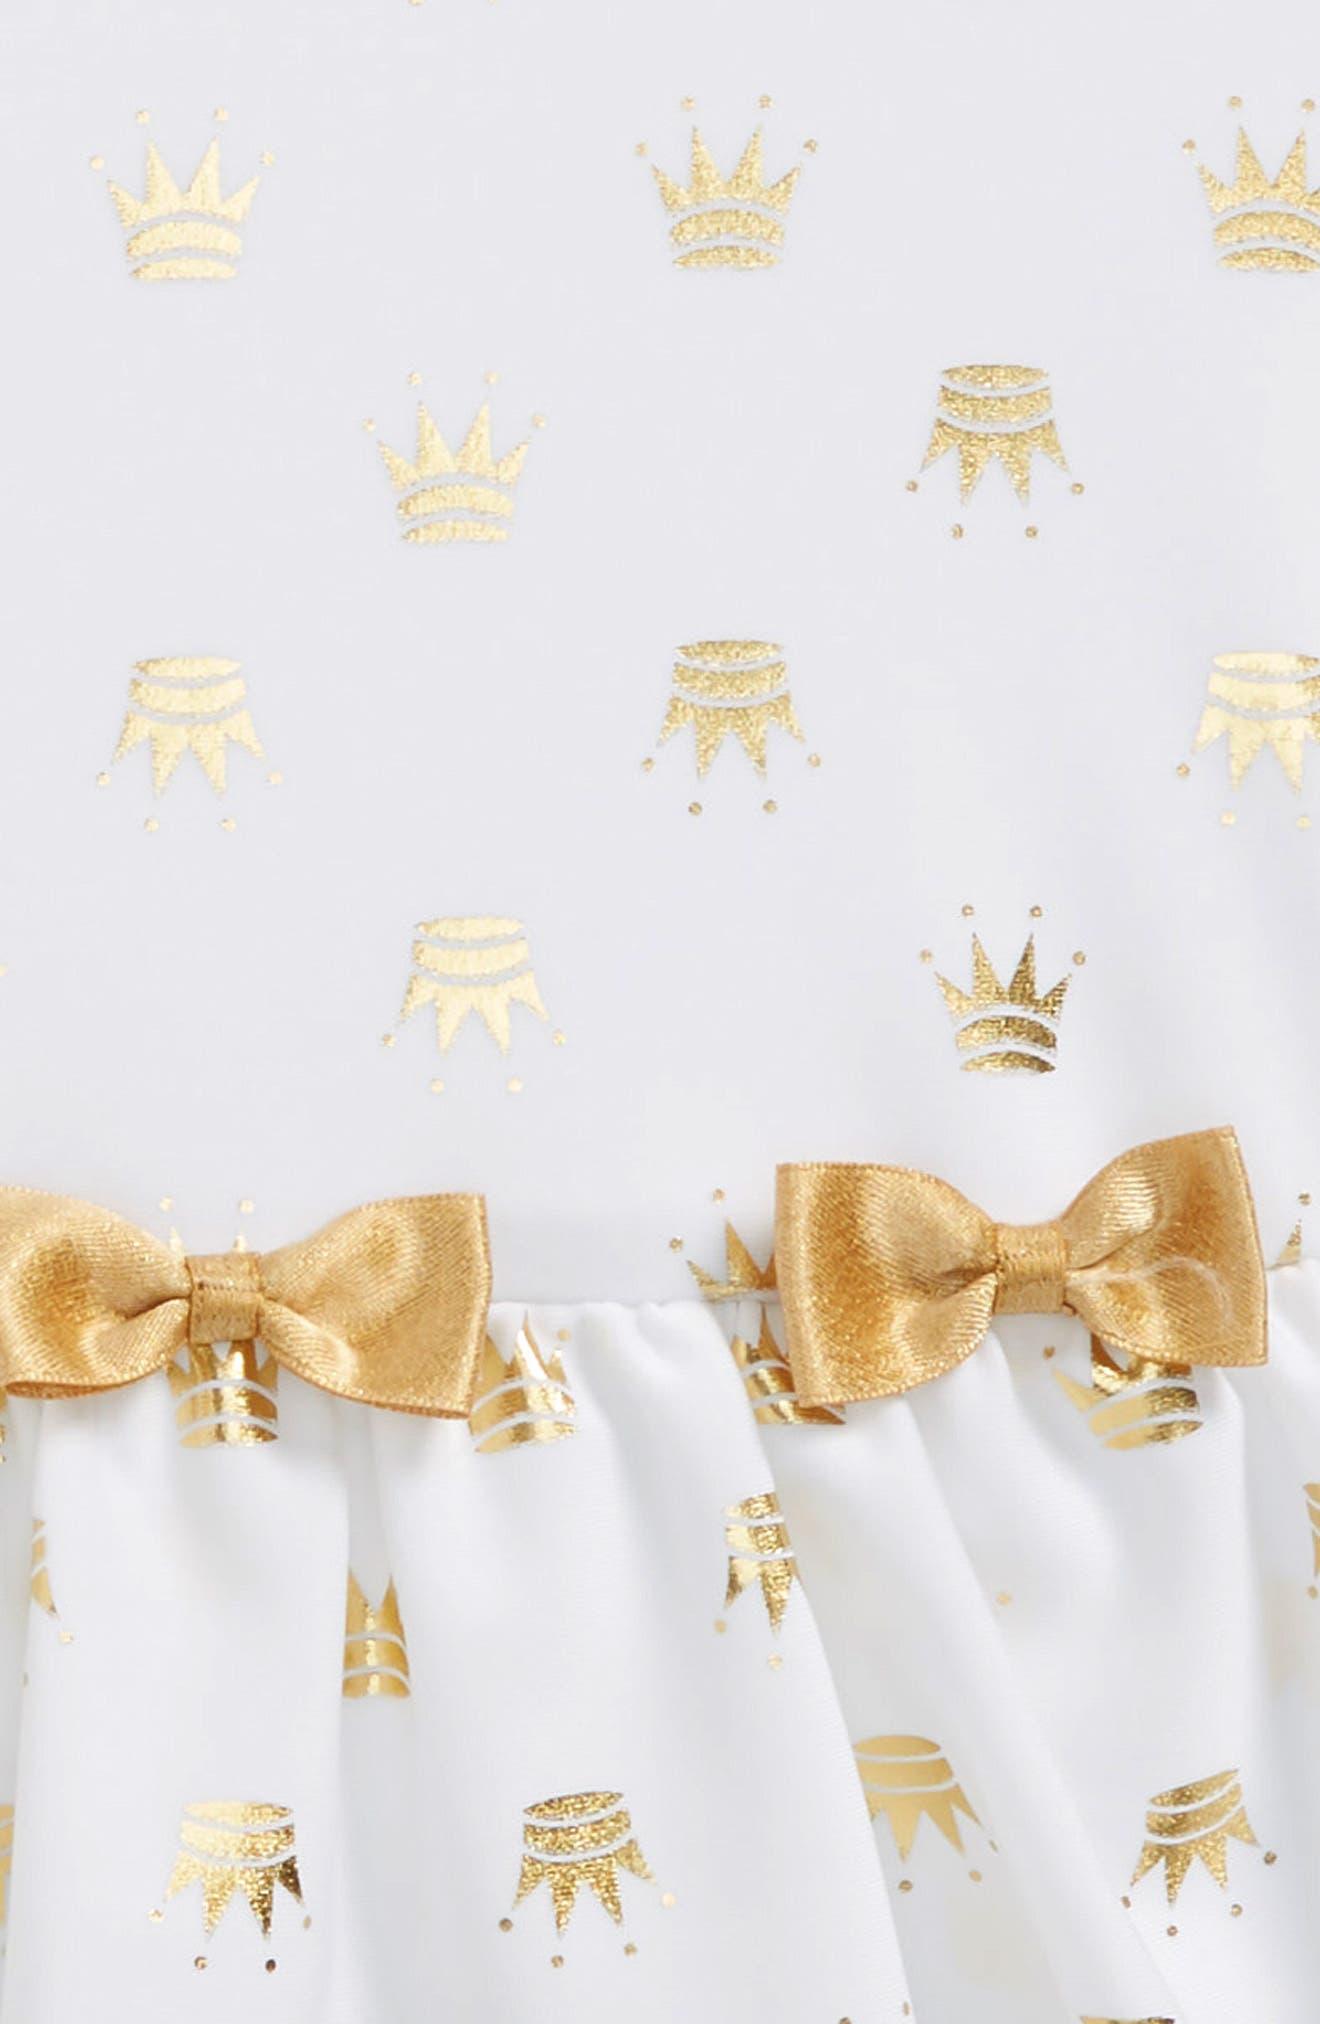 Gold Princess One-Piece Swimsuit,                             Alternate thumbnail 2, color,                             100